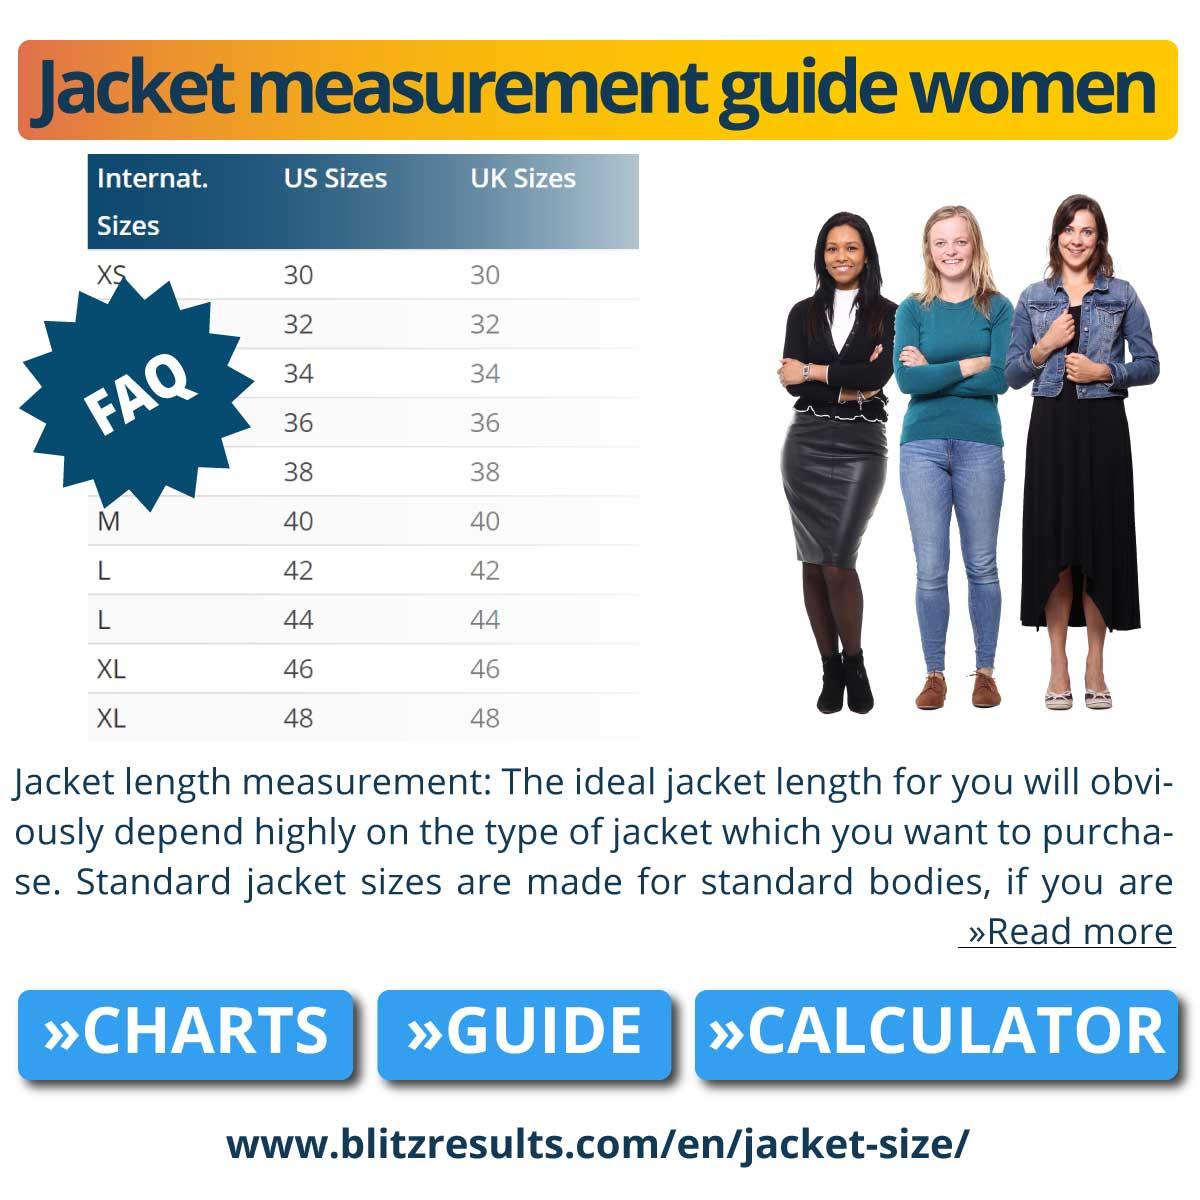 Jacket measurement guide women